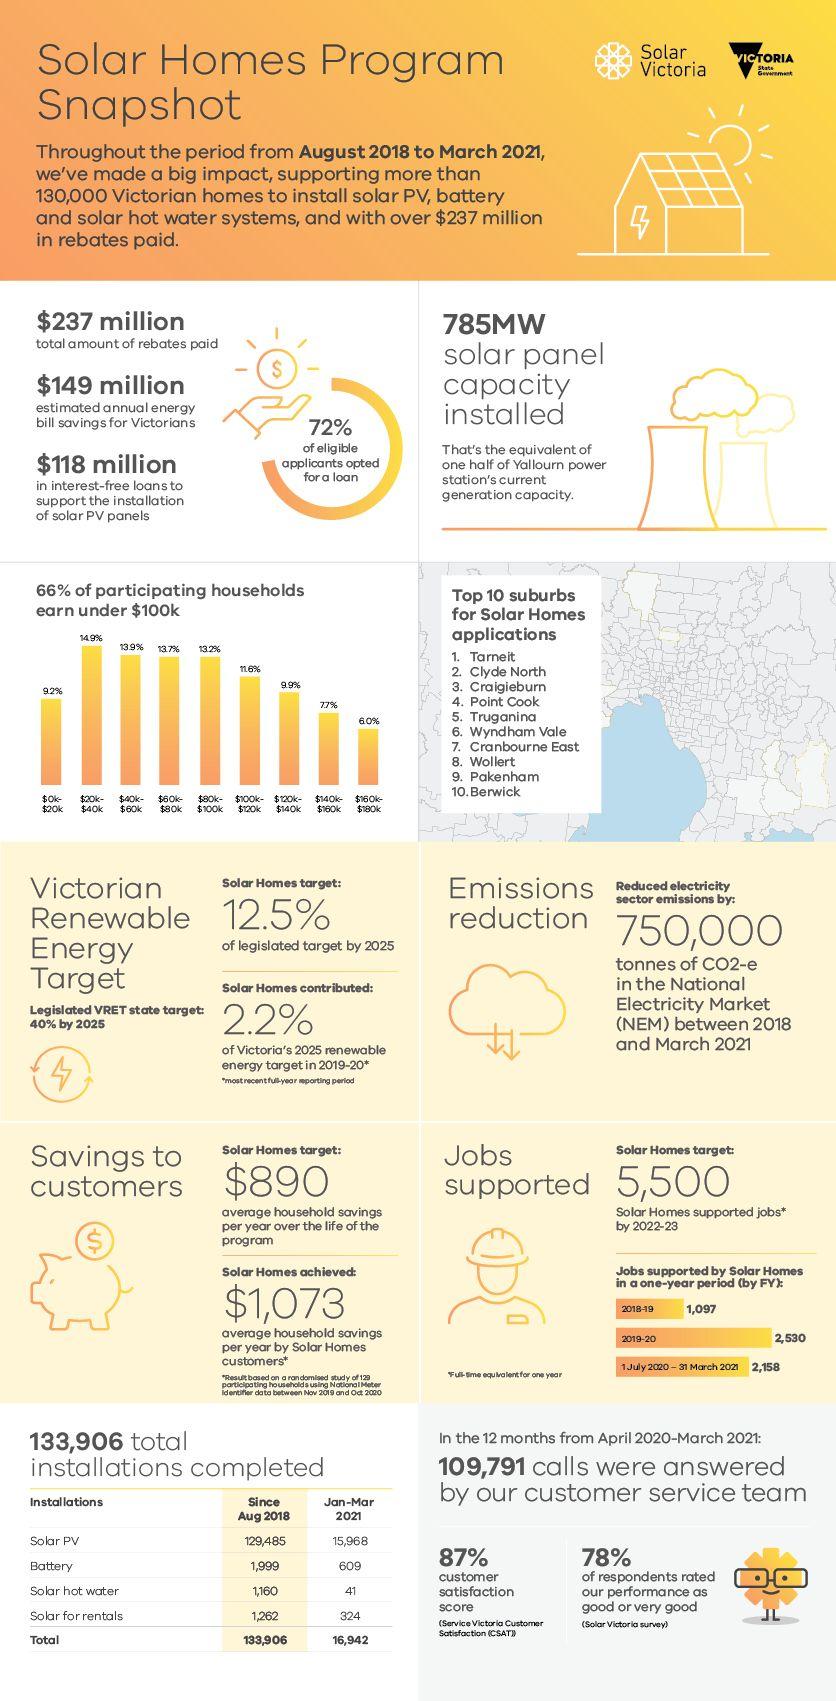 Solar Homes Program Snapshot